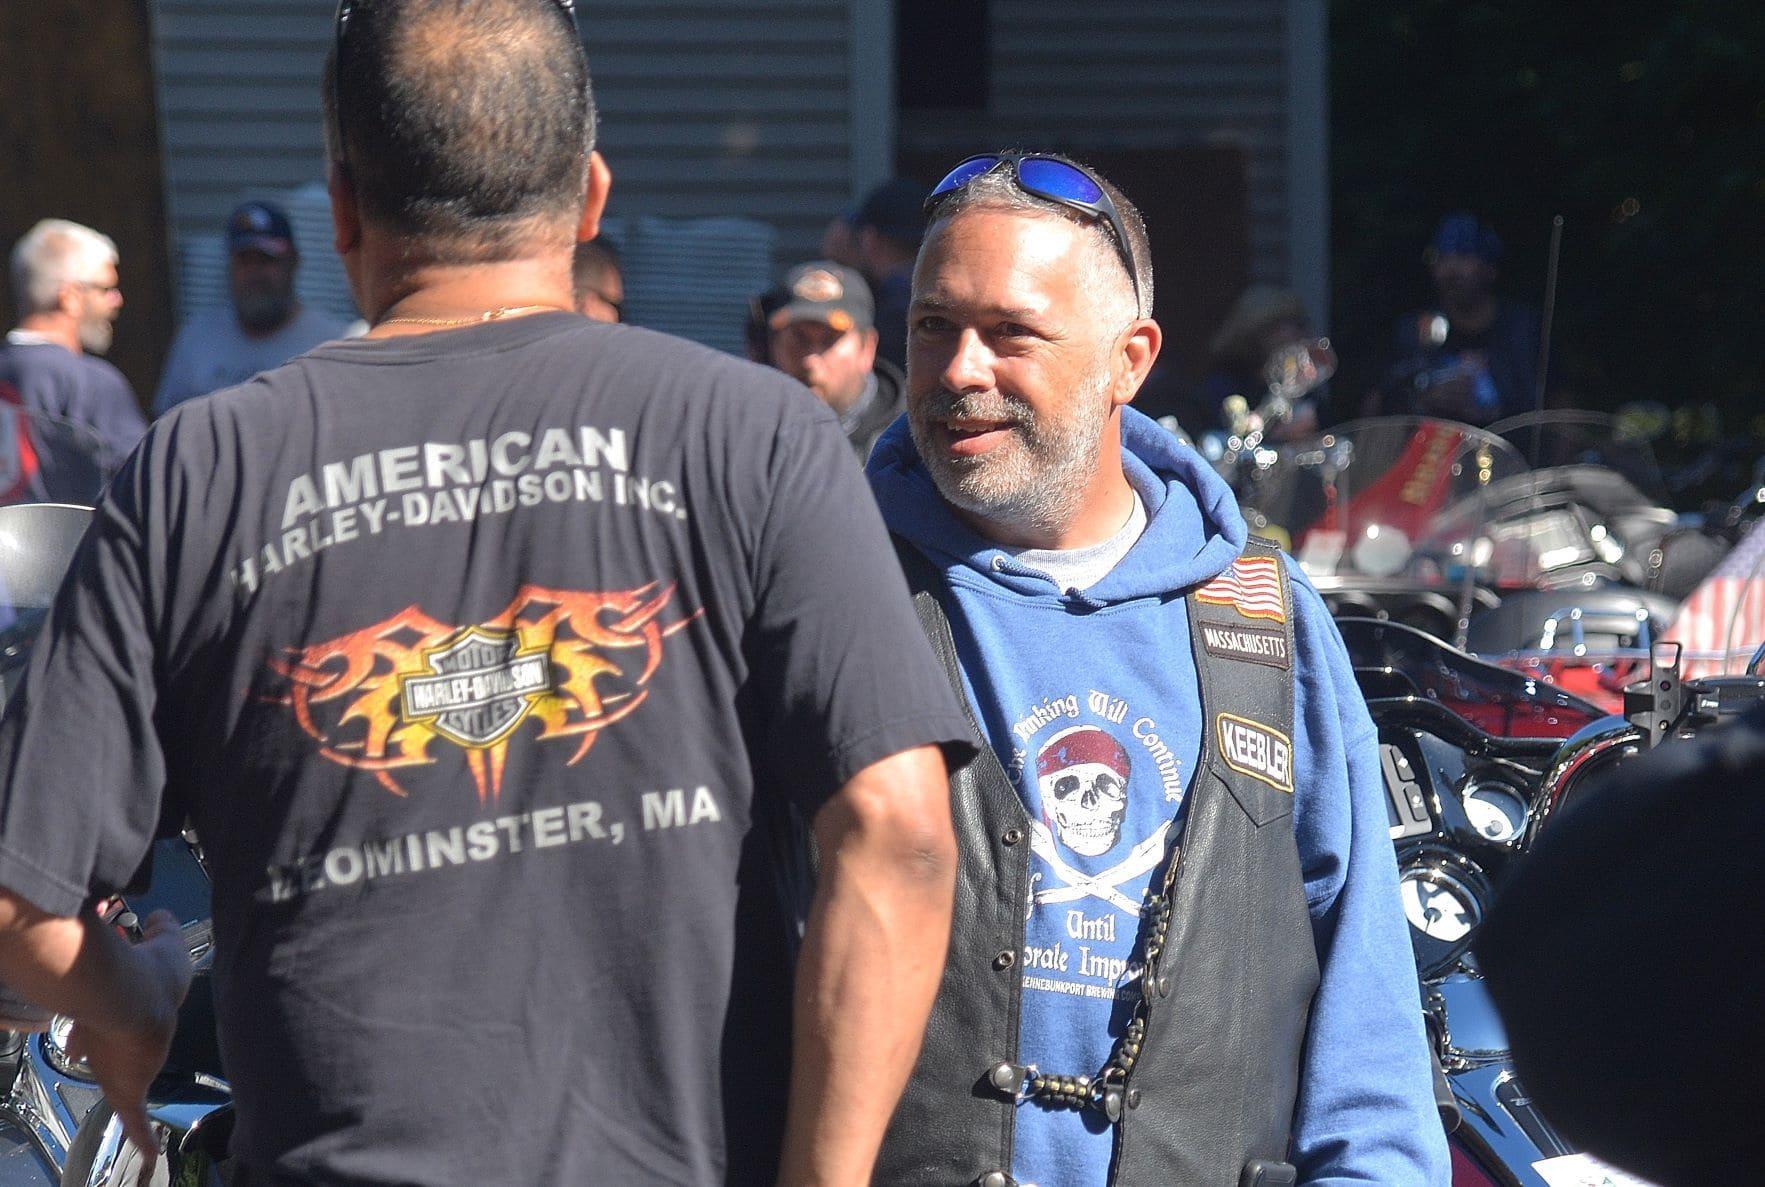 Select Board member Shawn Sadowski mingles before the fundraising motorcycle ride.